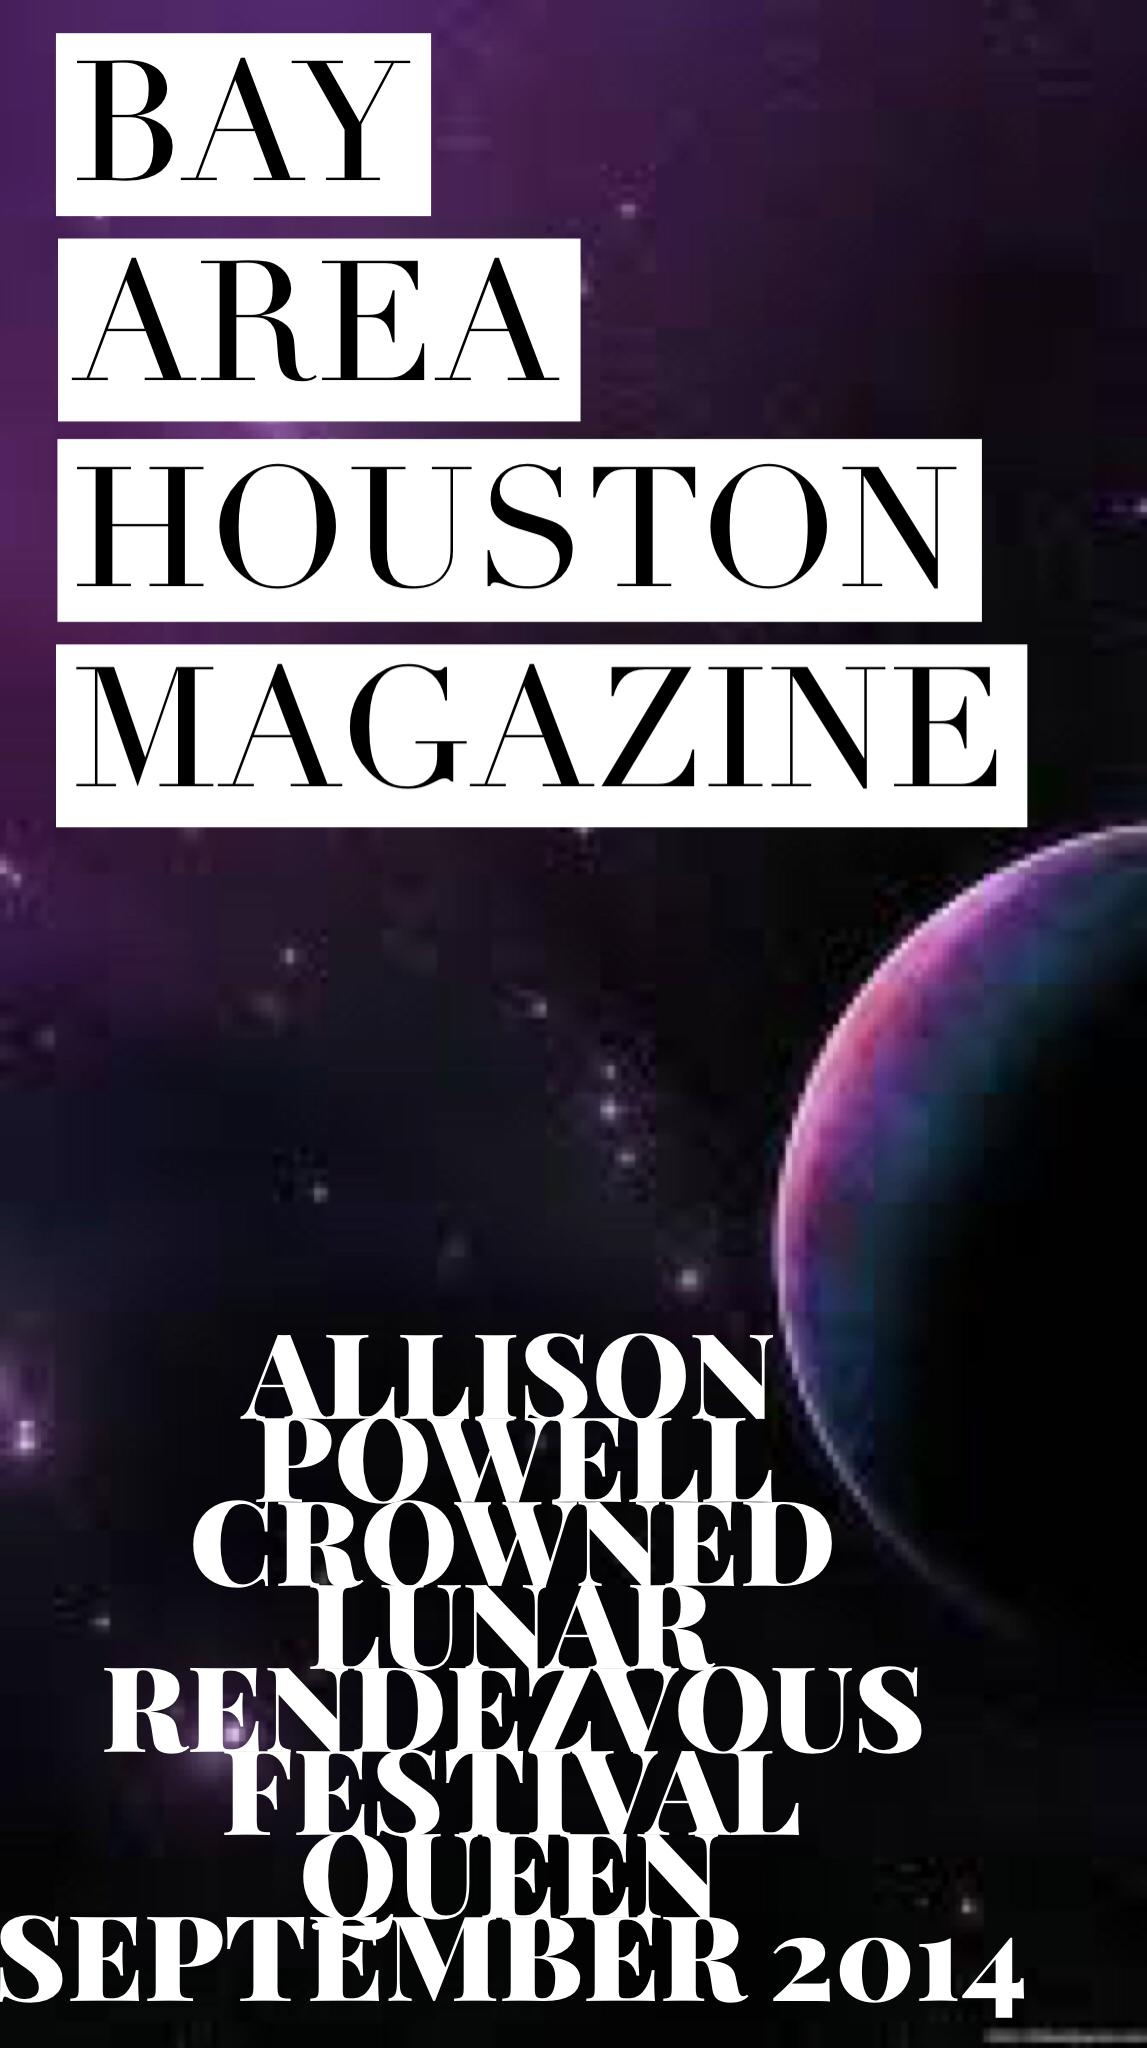 Bay Area Houston Magazine